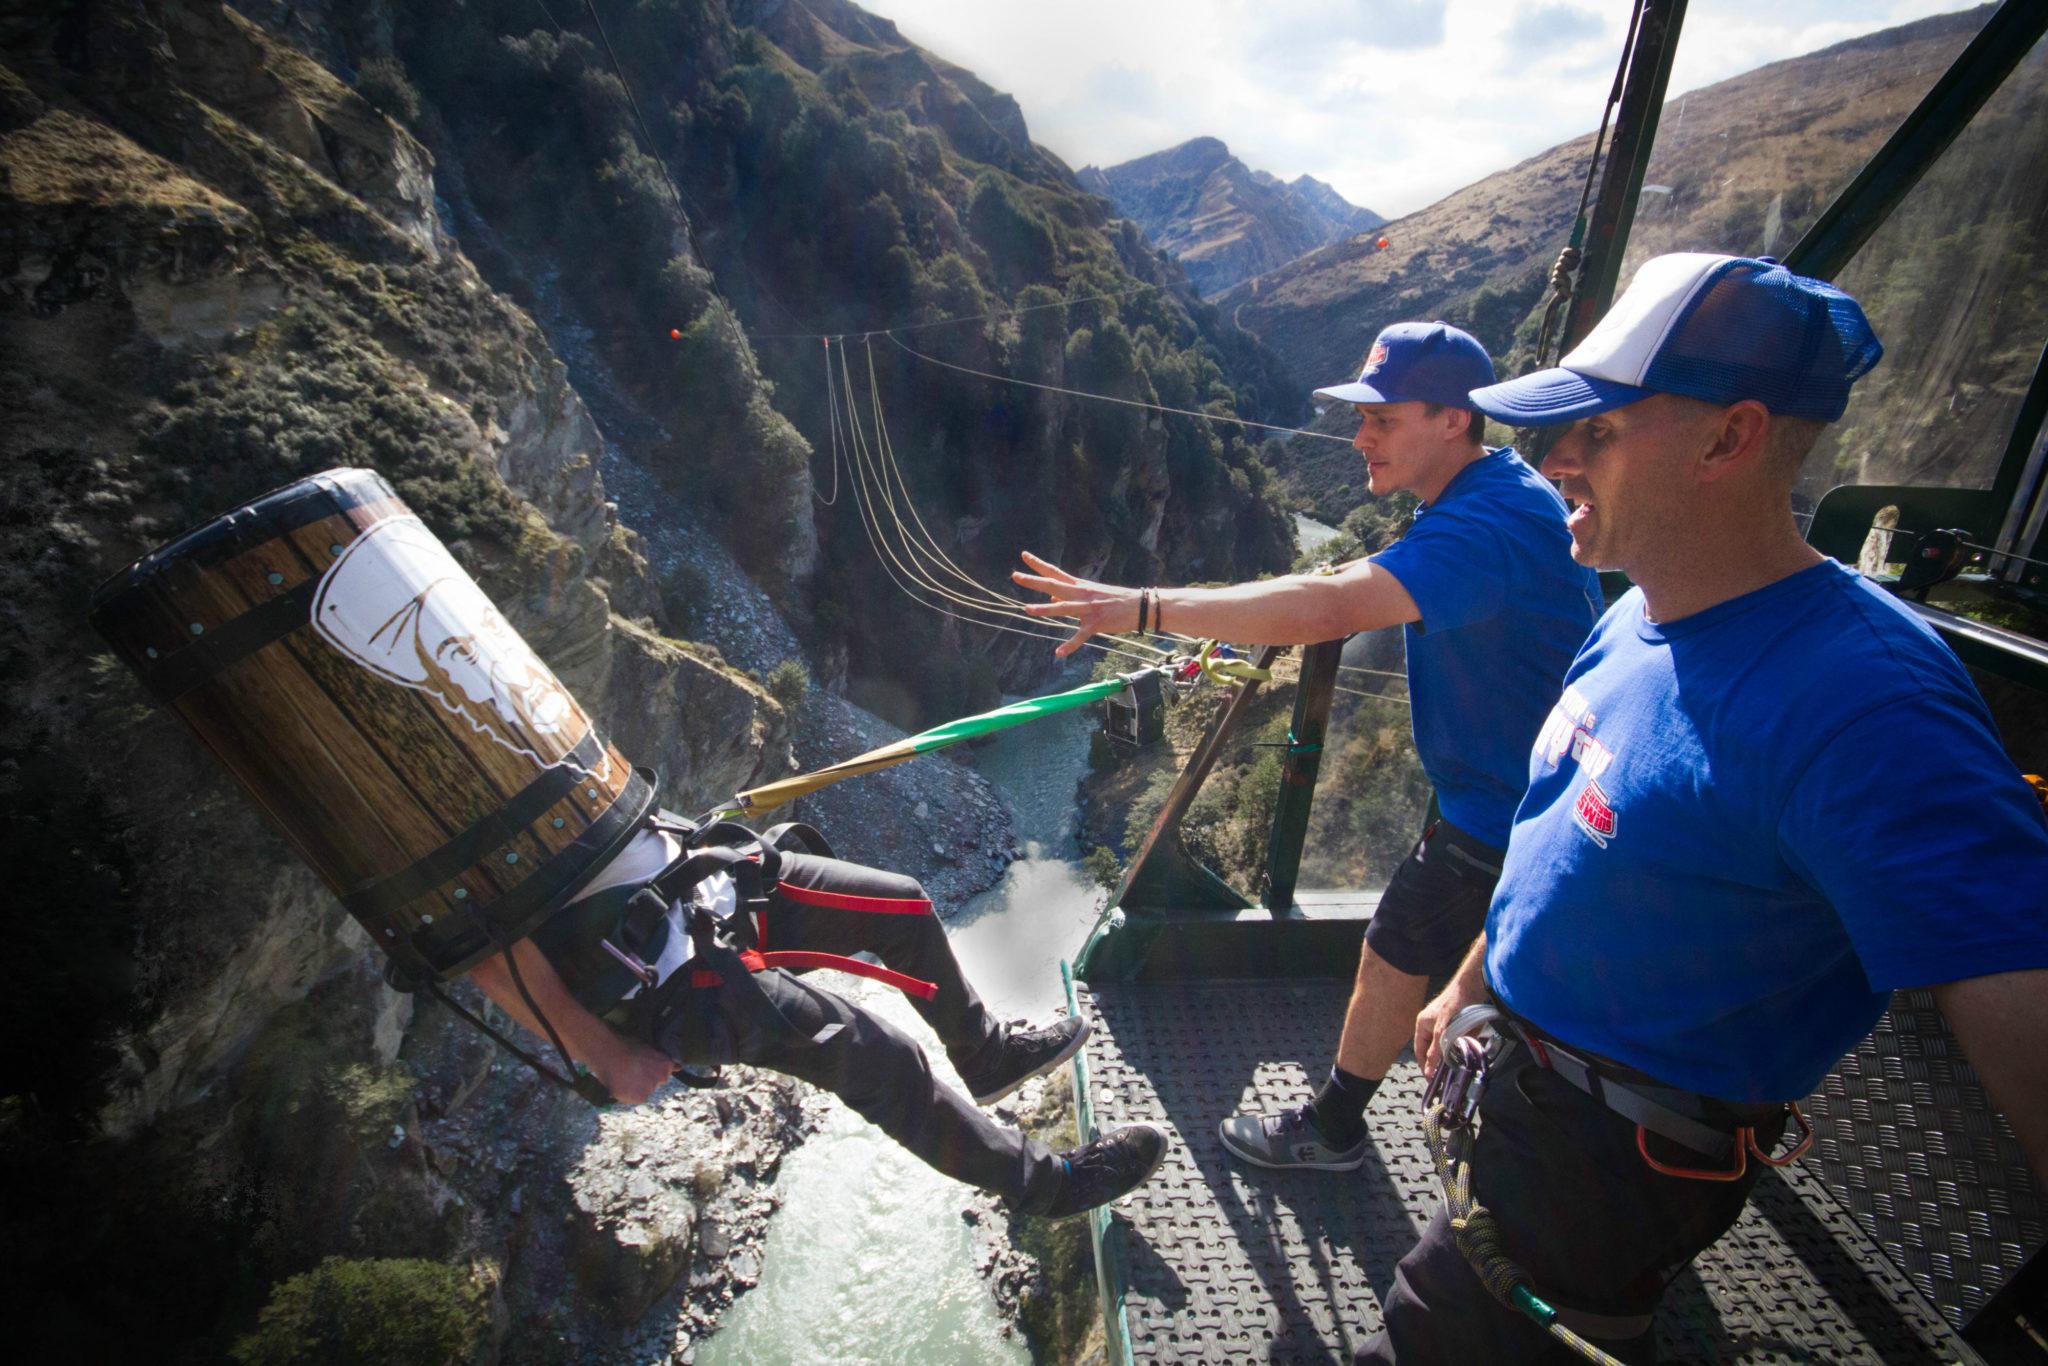 Shotover Canyon Swing Bin Laden